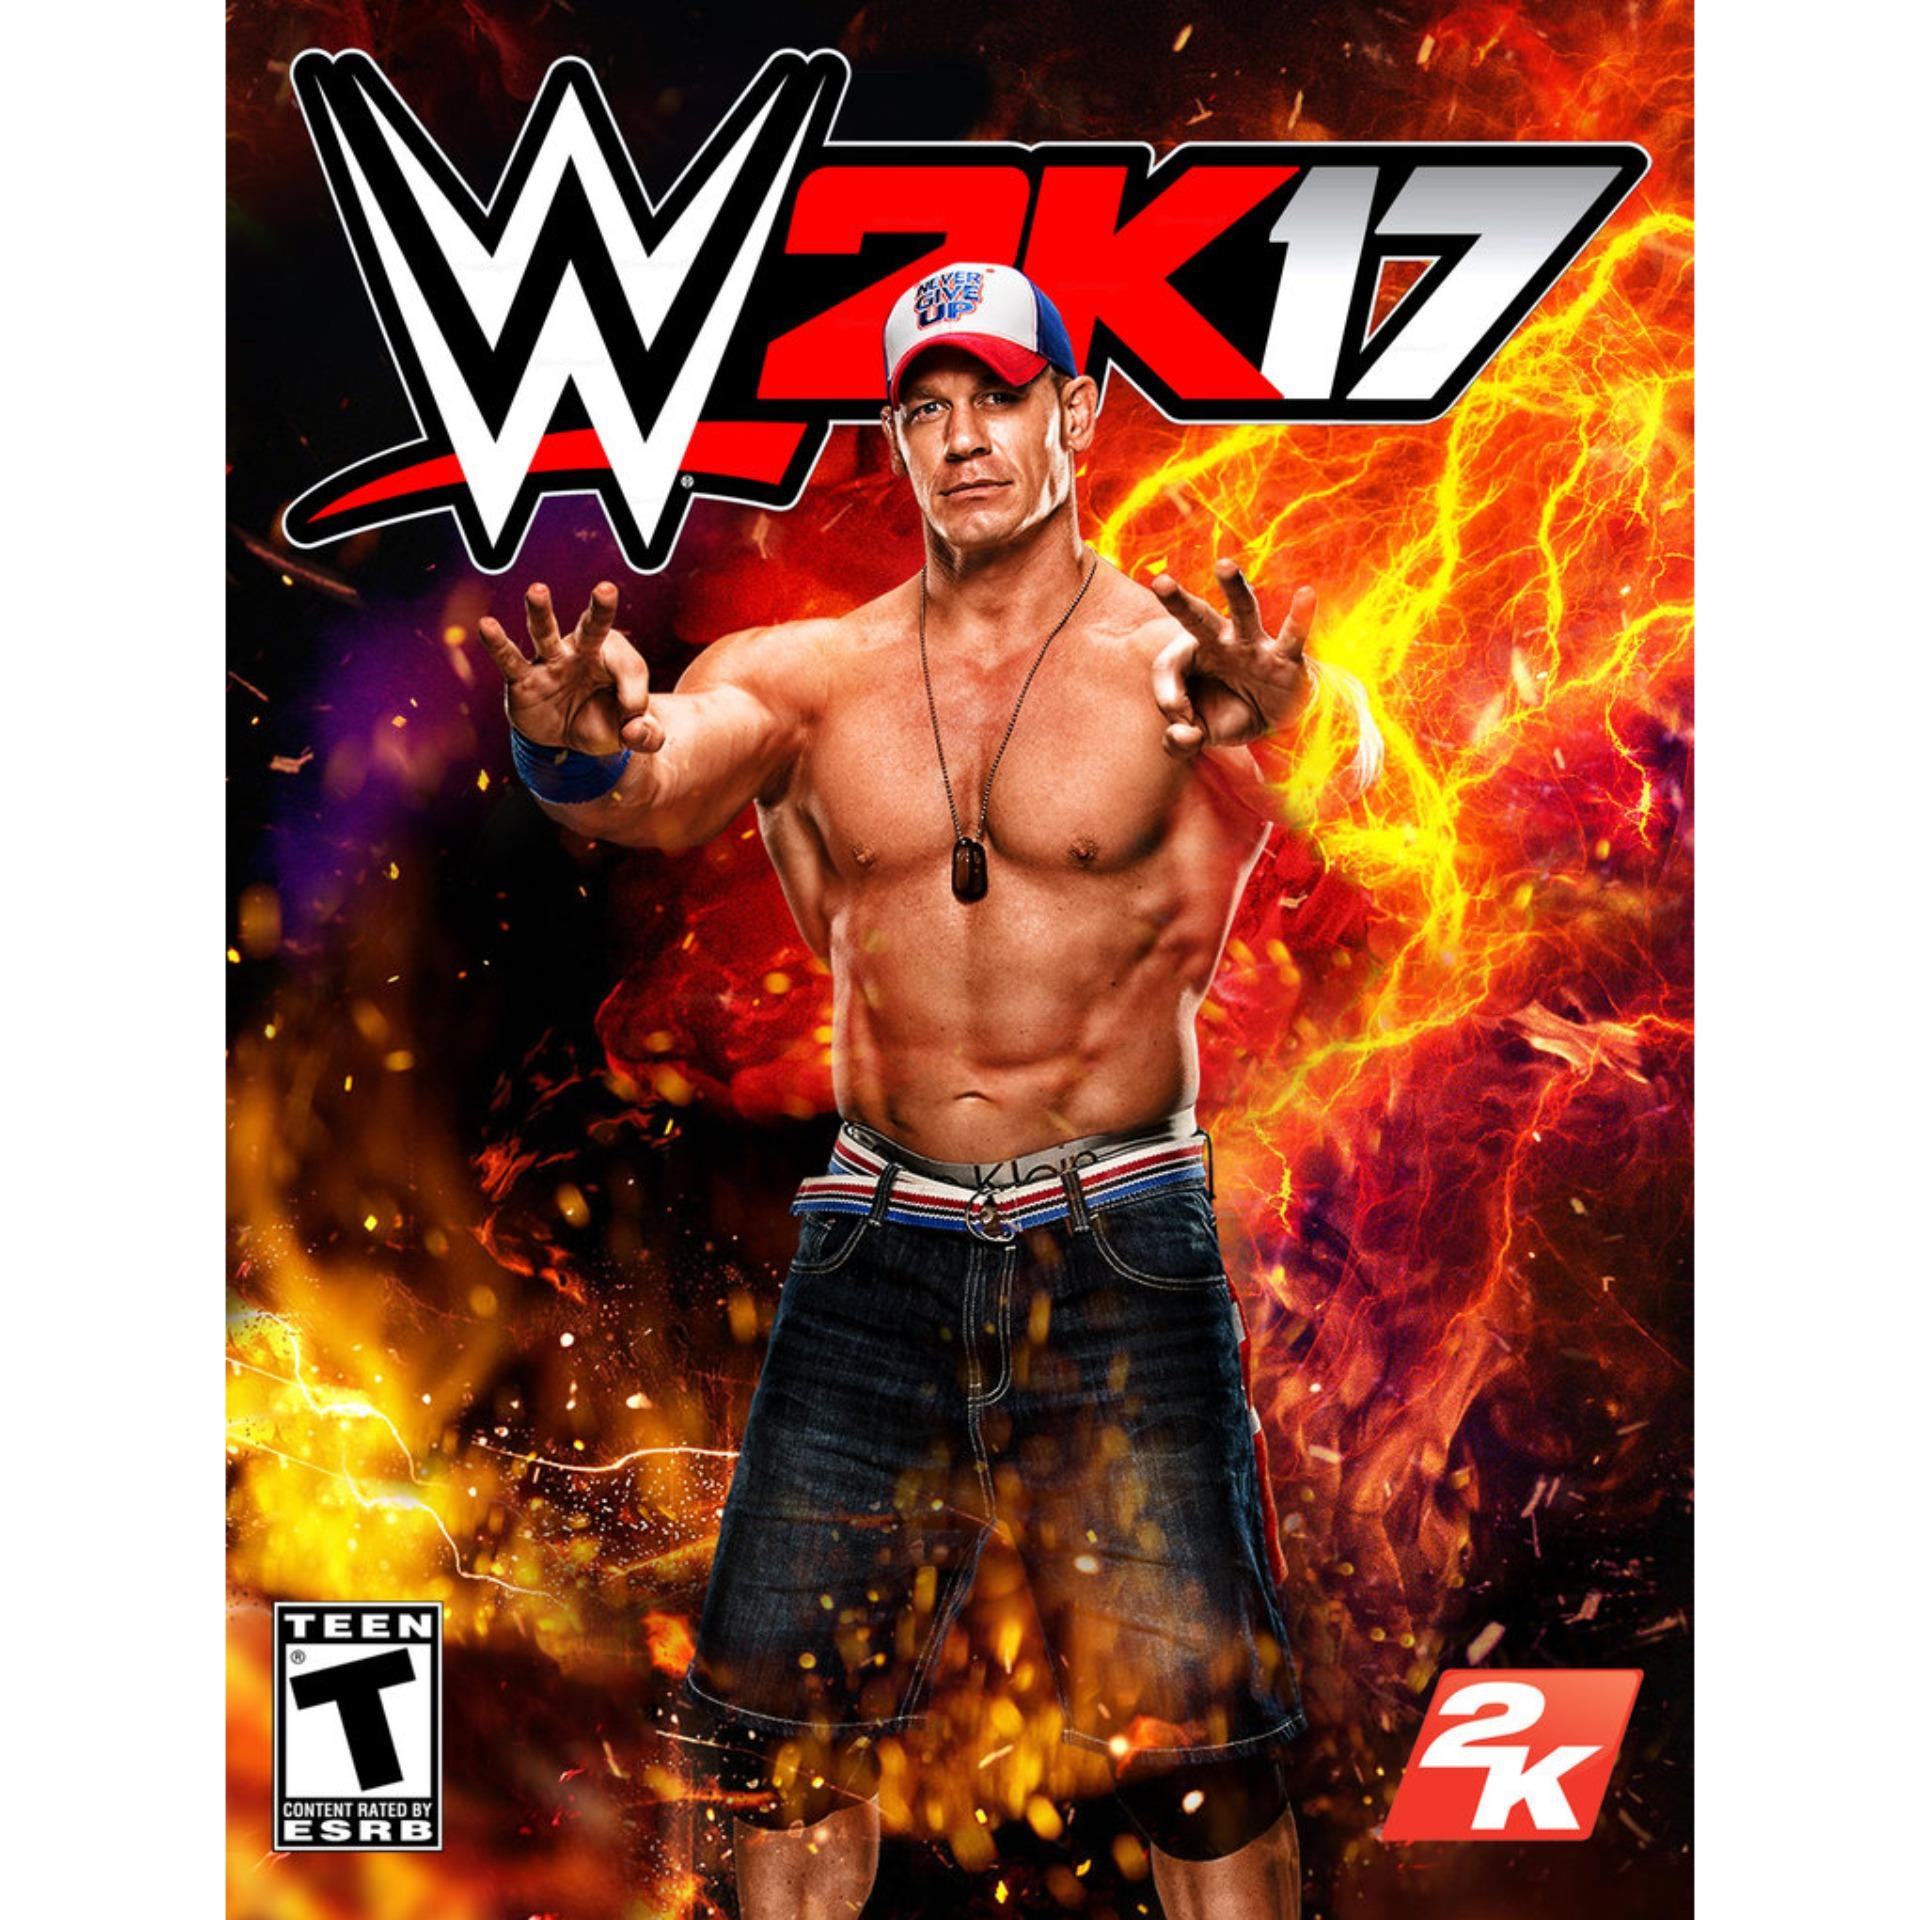 WWE 2K17 full Game PC (PC GAMES/ DVD GAME PC)